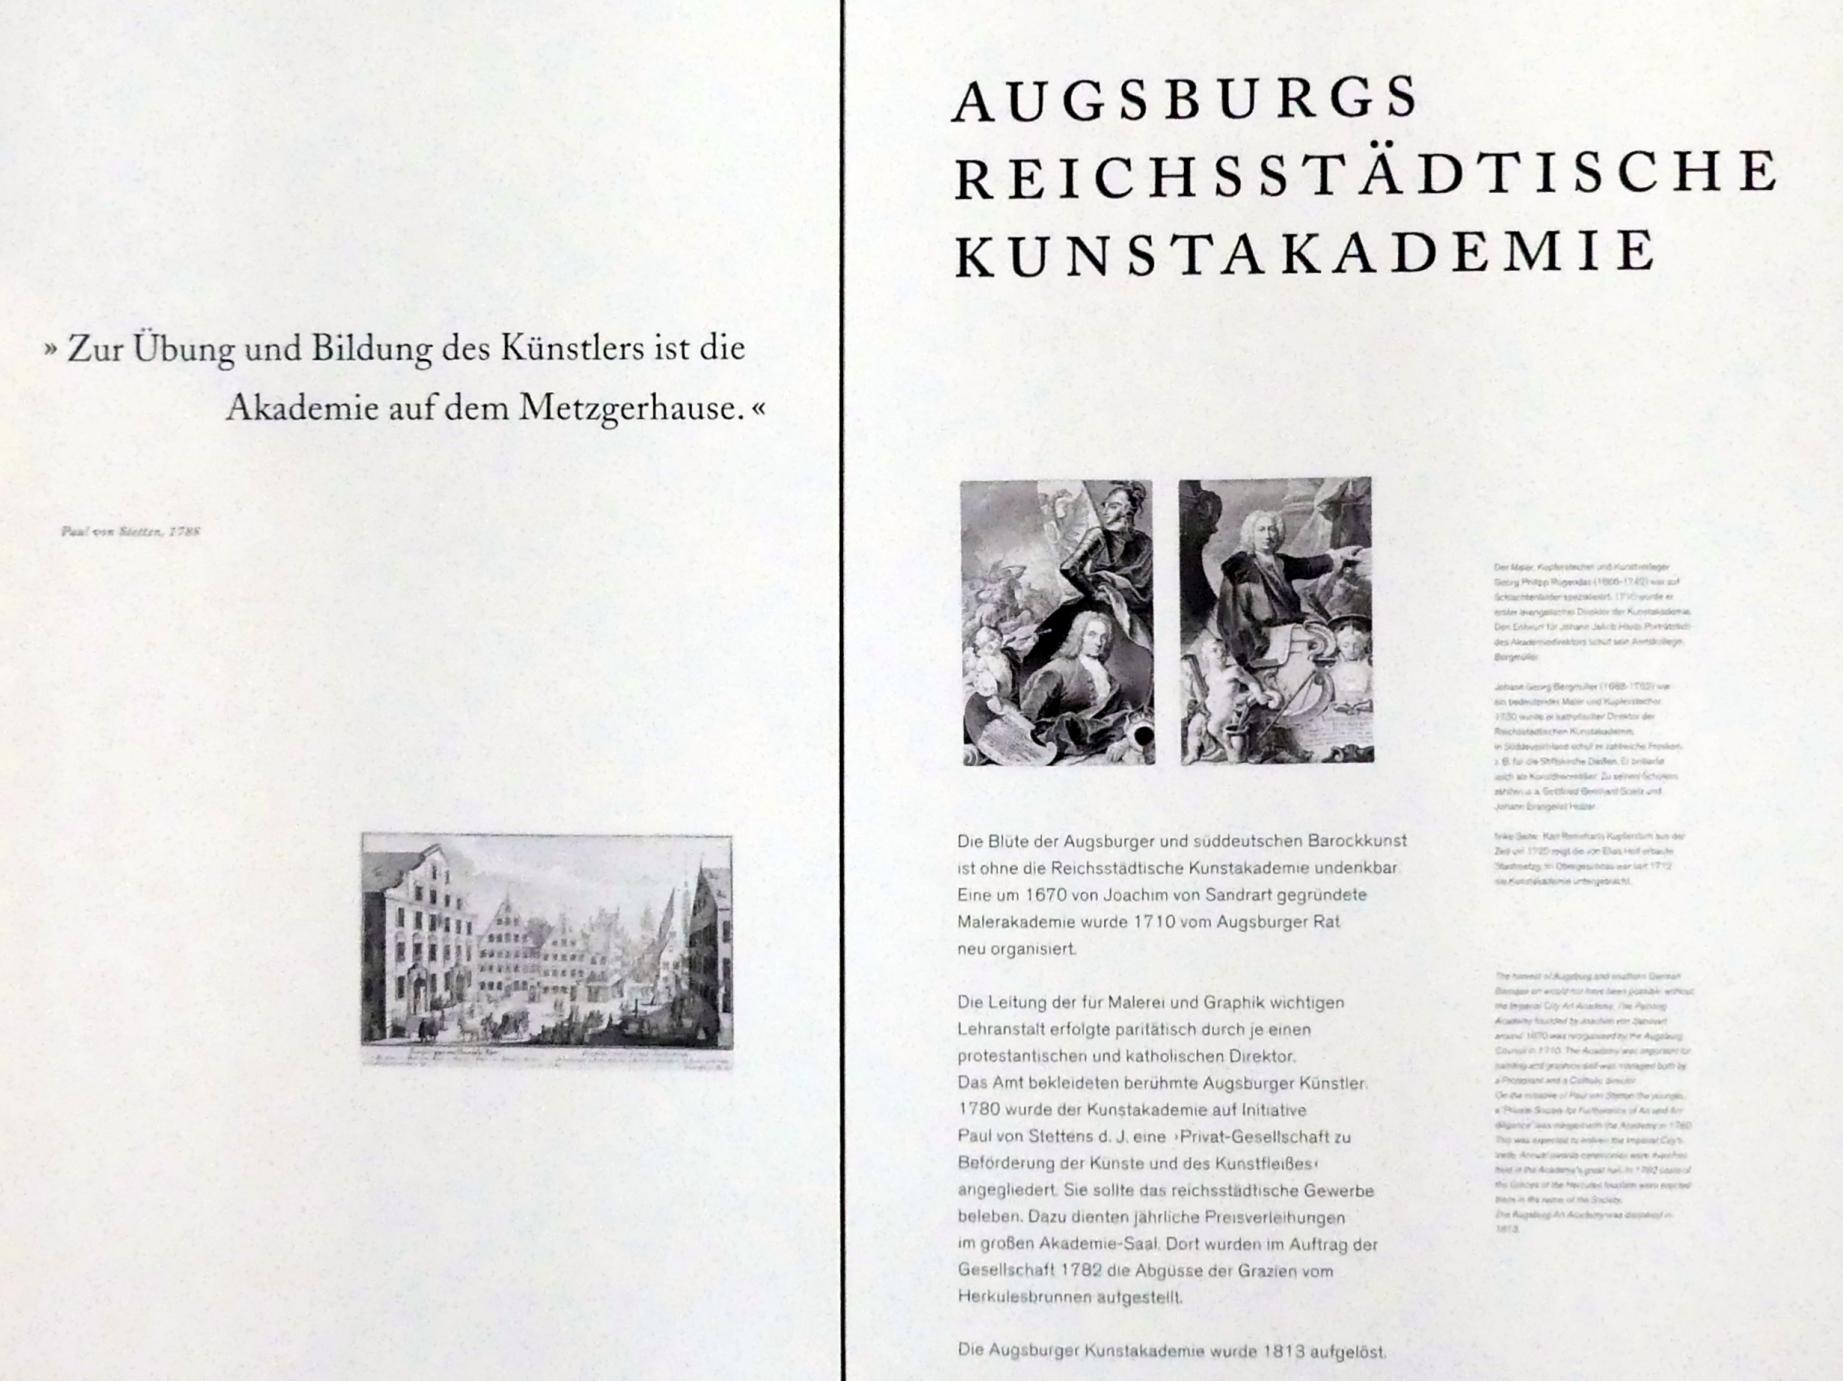 Augsburg, Maximilian Museum, Kunstakademie Augsburg, Bild 1/2